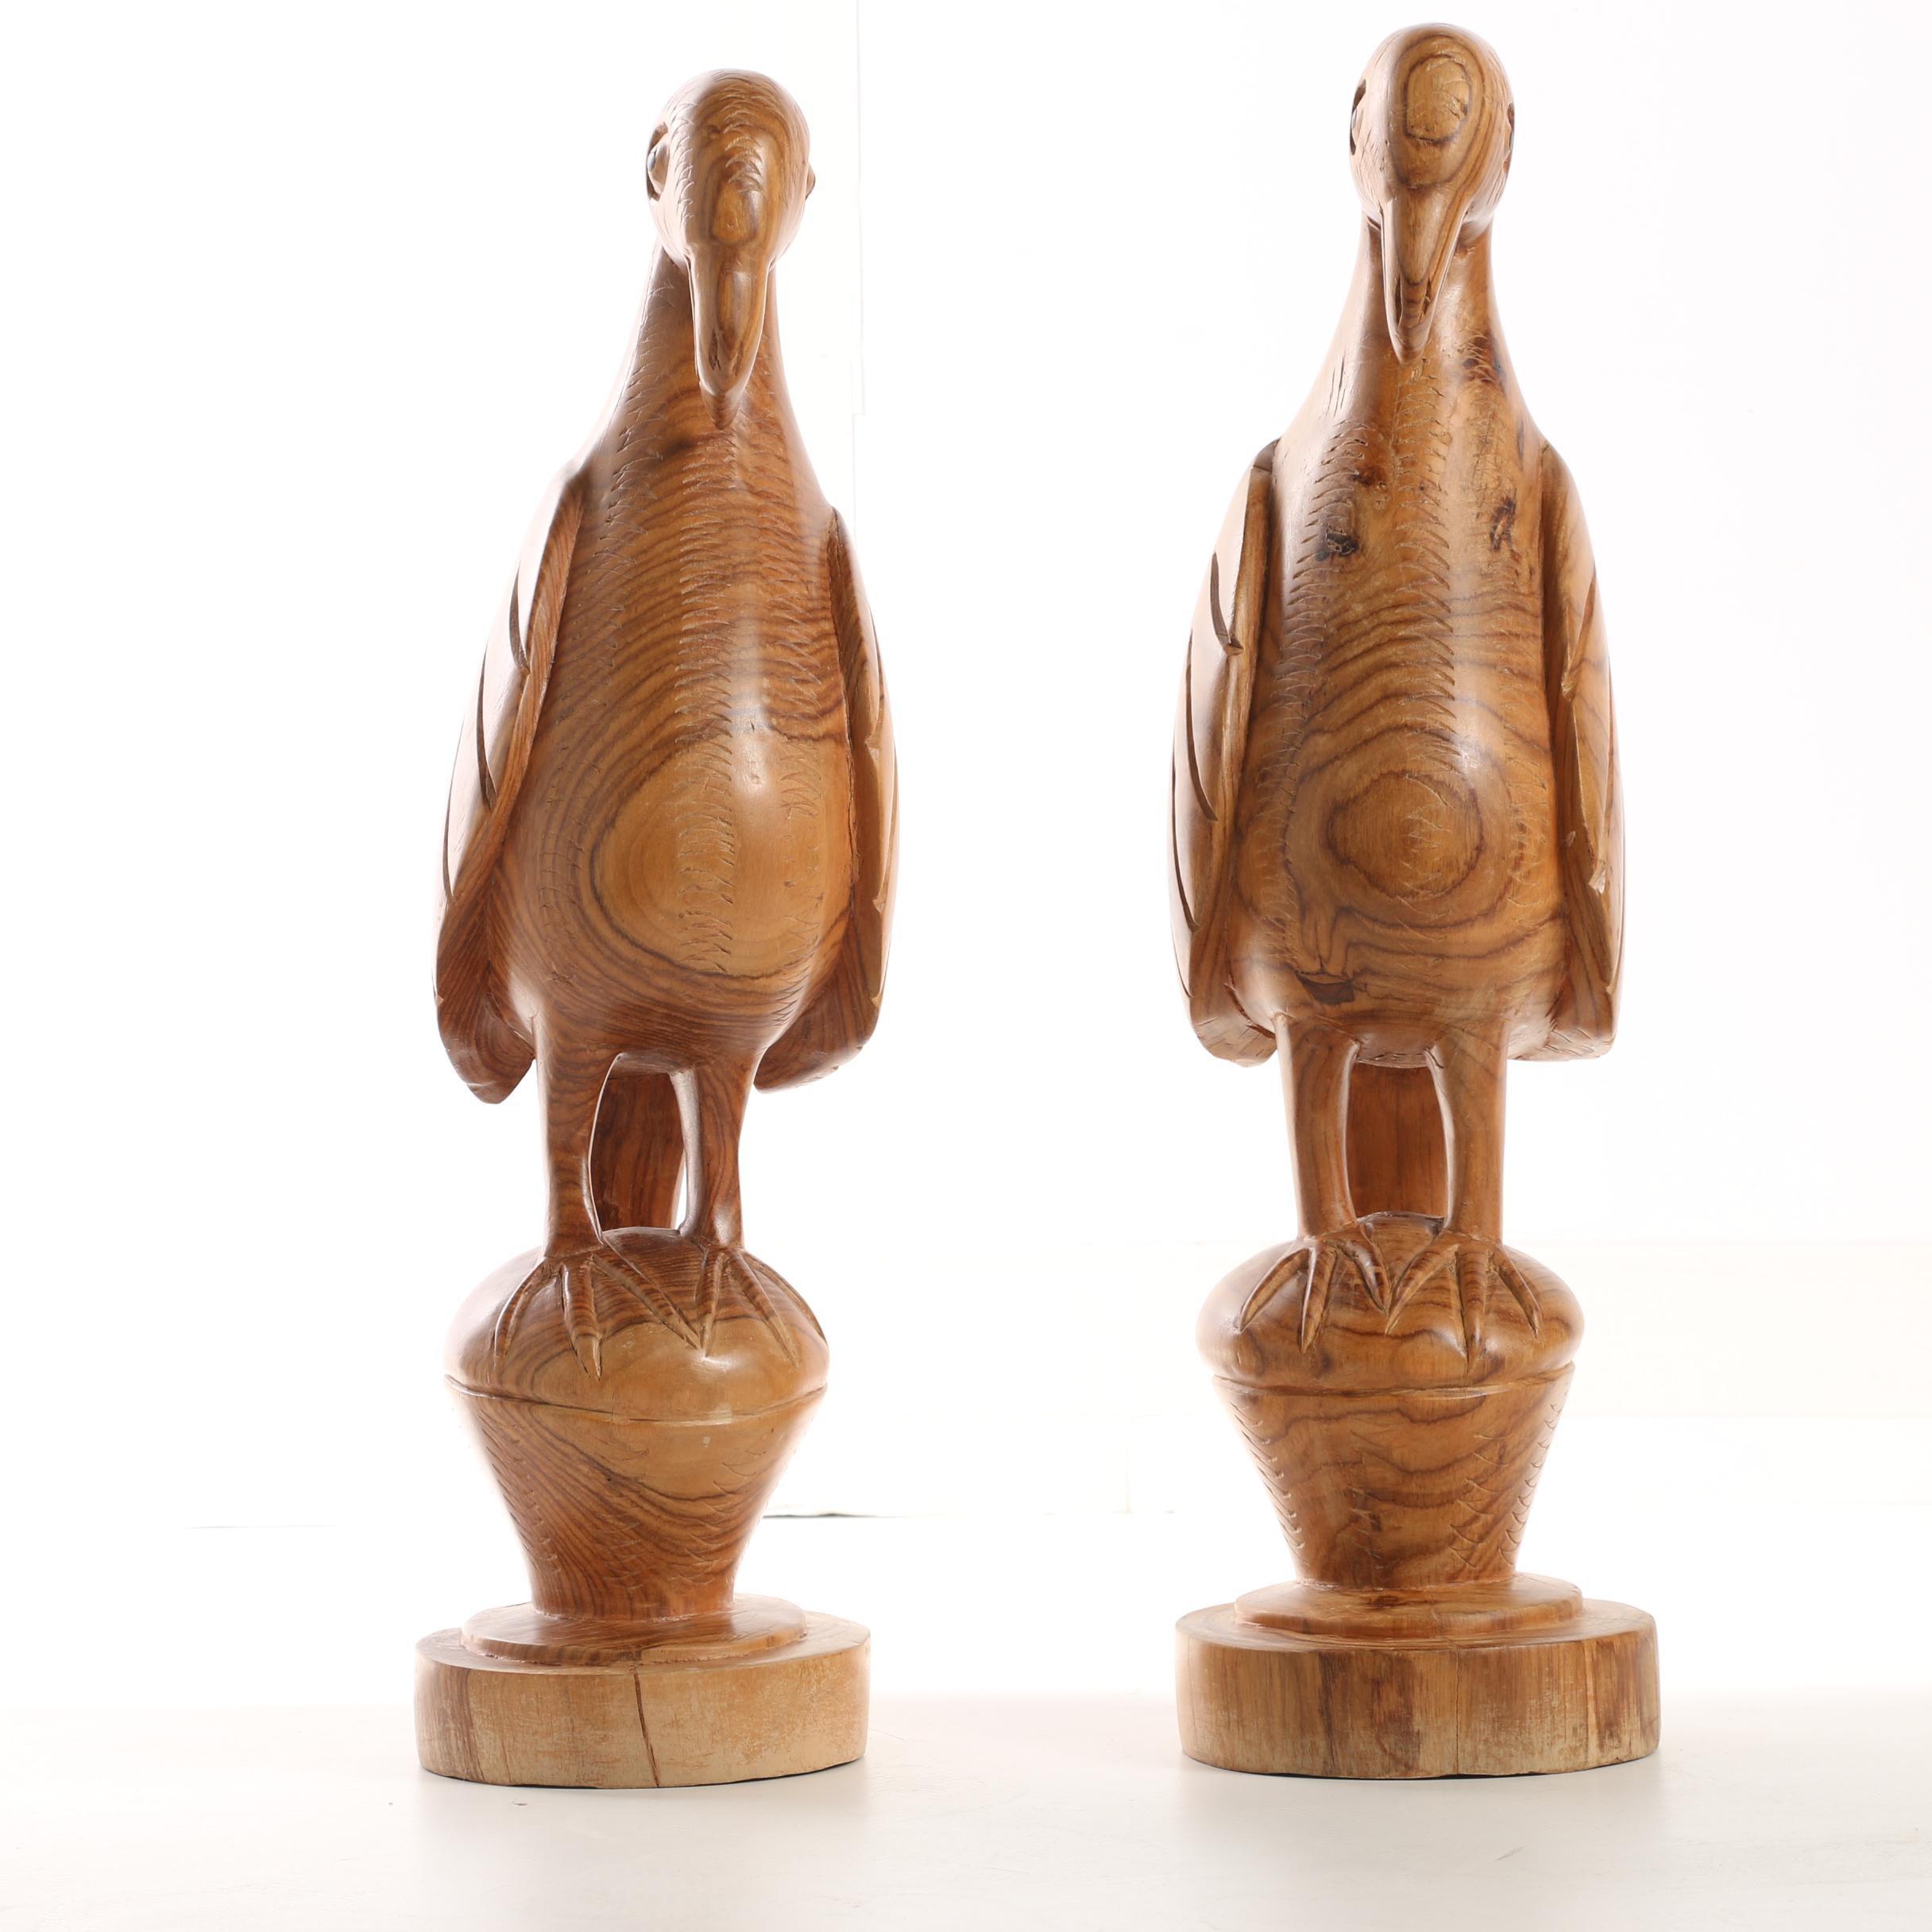 Carved Wooden Bird Sculptures